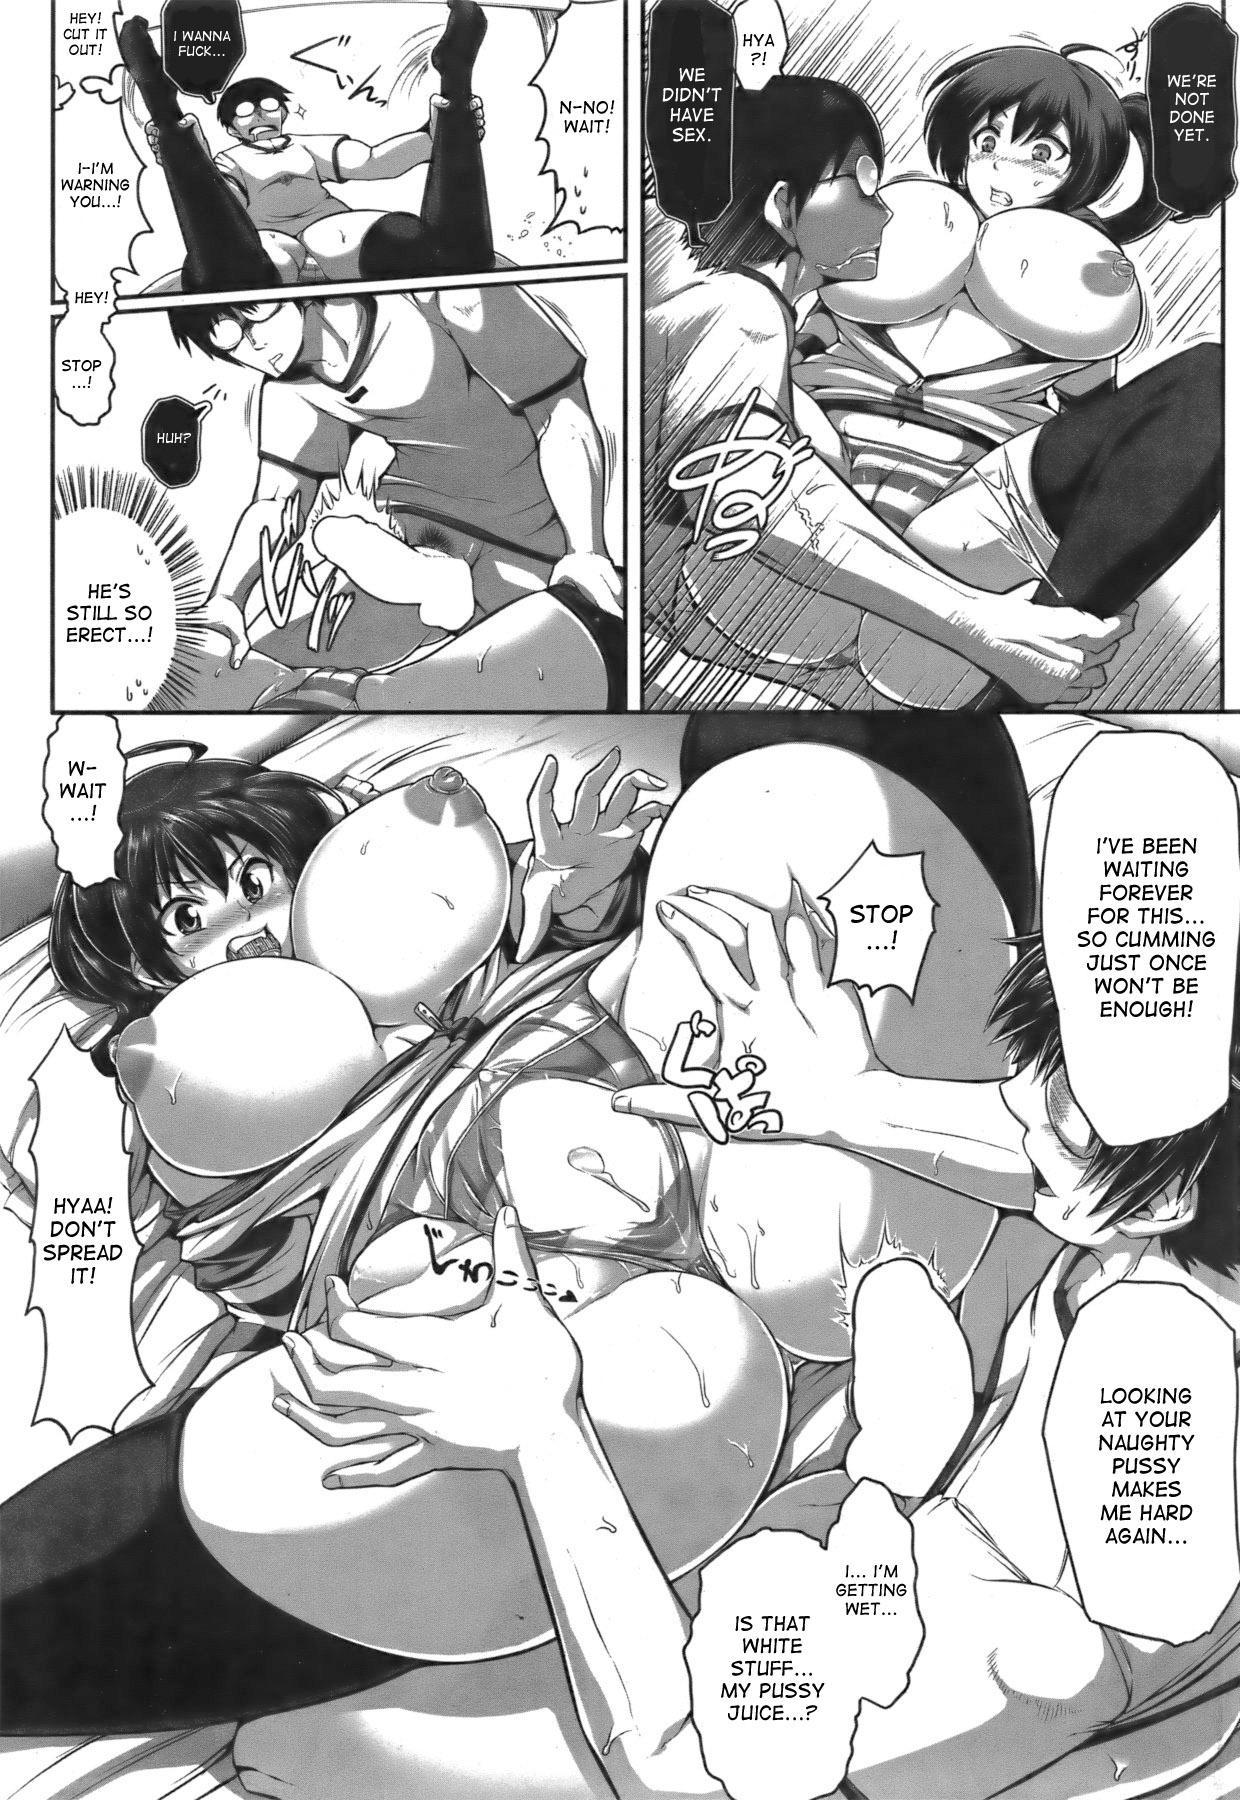 The Great Ero Doujin Story 8